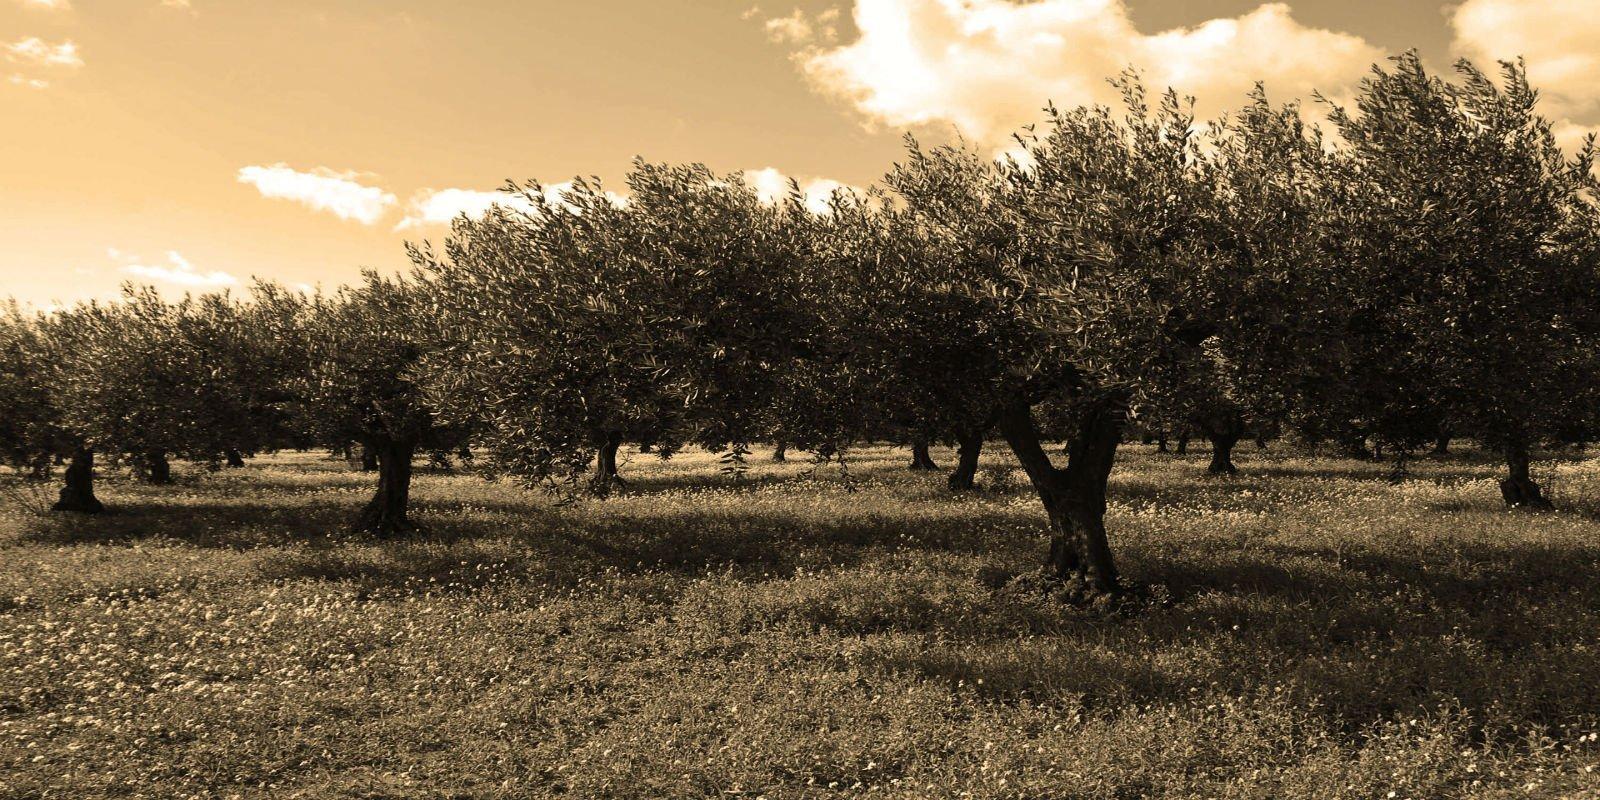 L'oliveto al tramonto